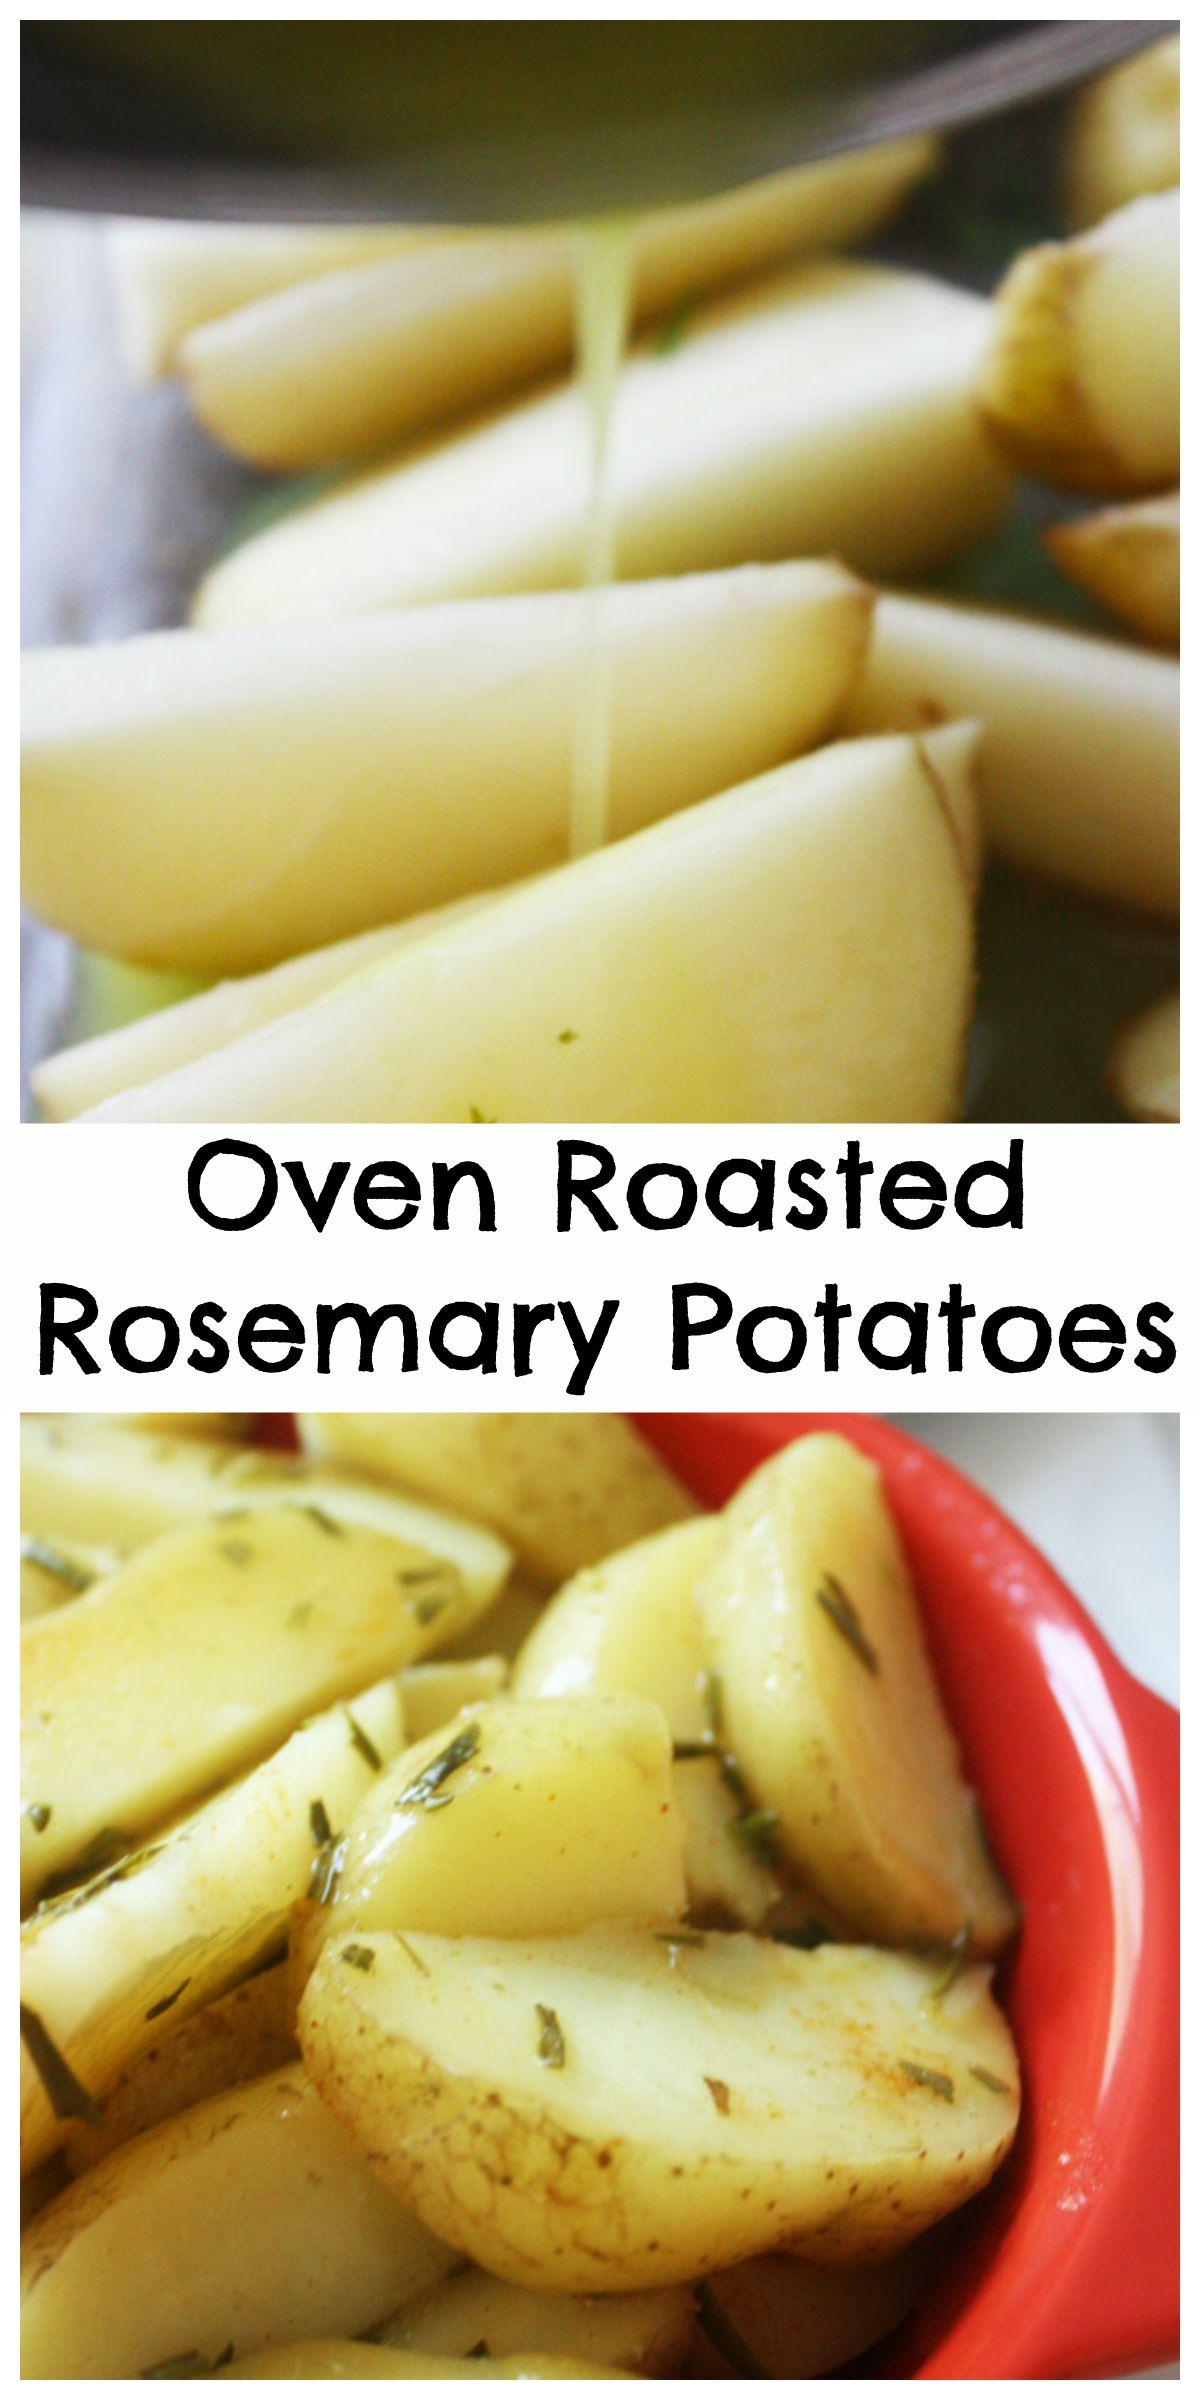 oven roasted rosemary potatoes pin